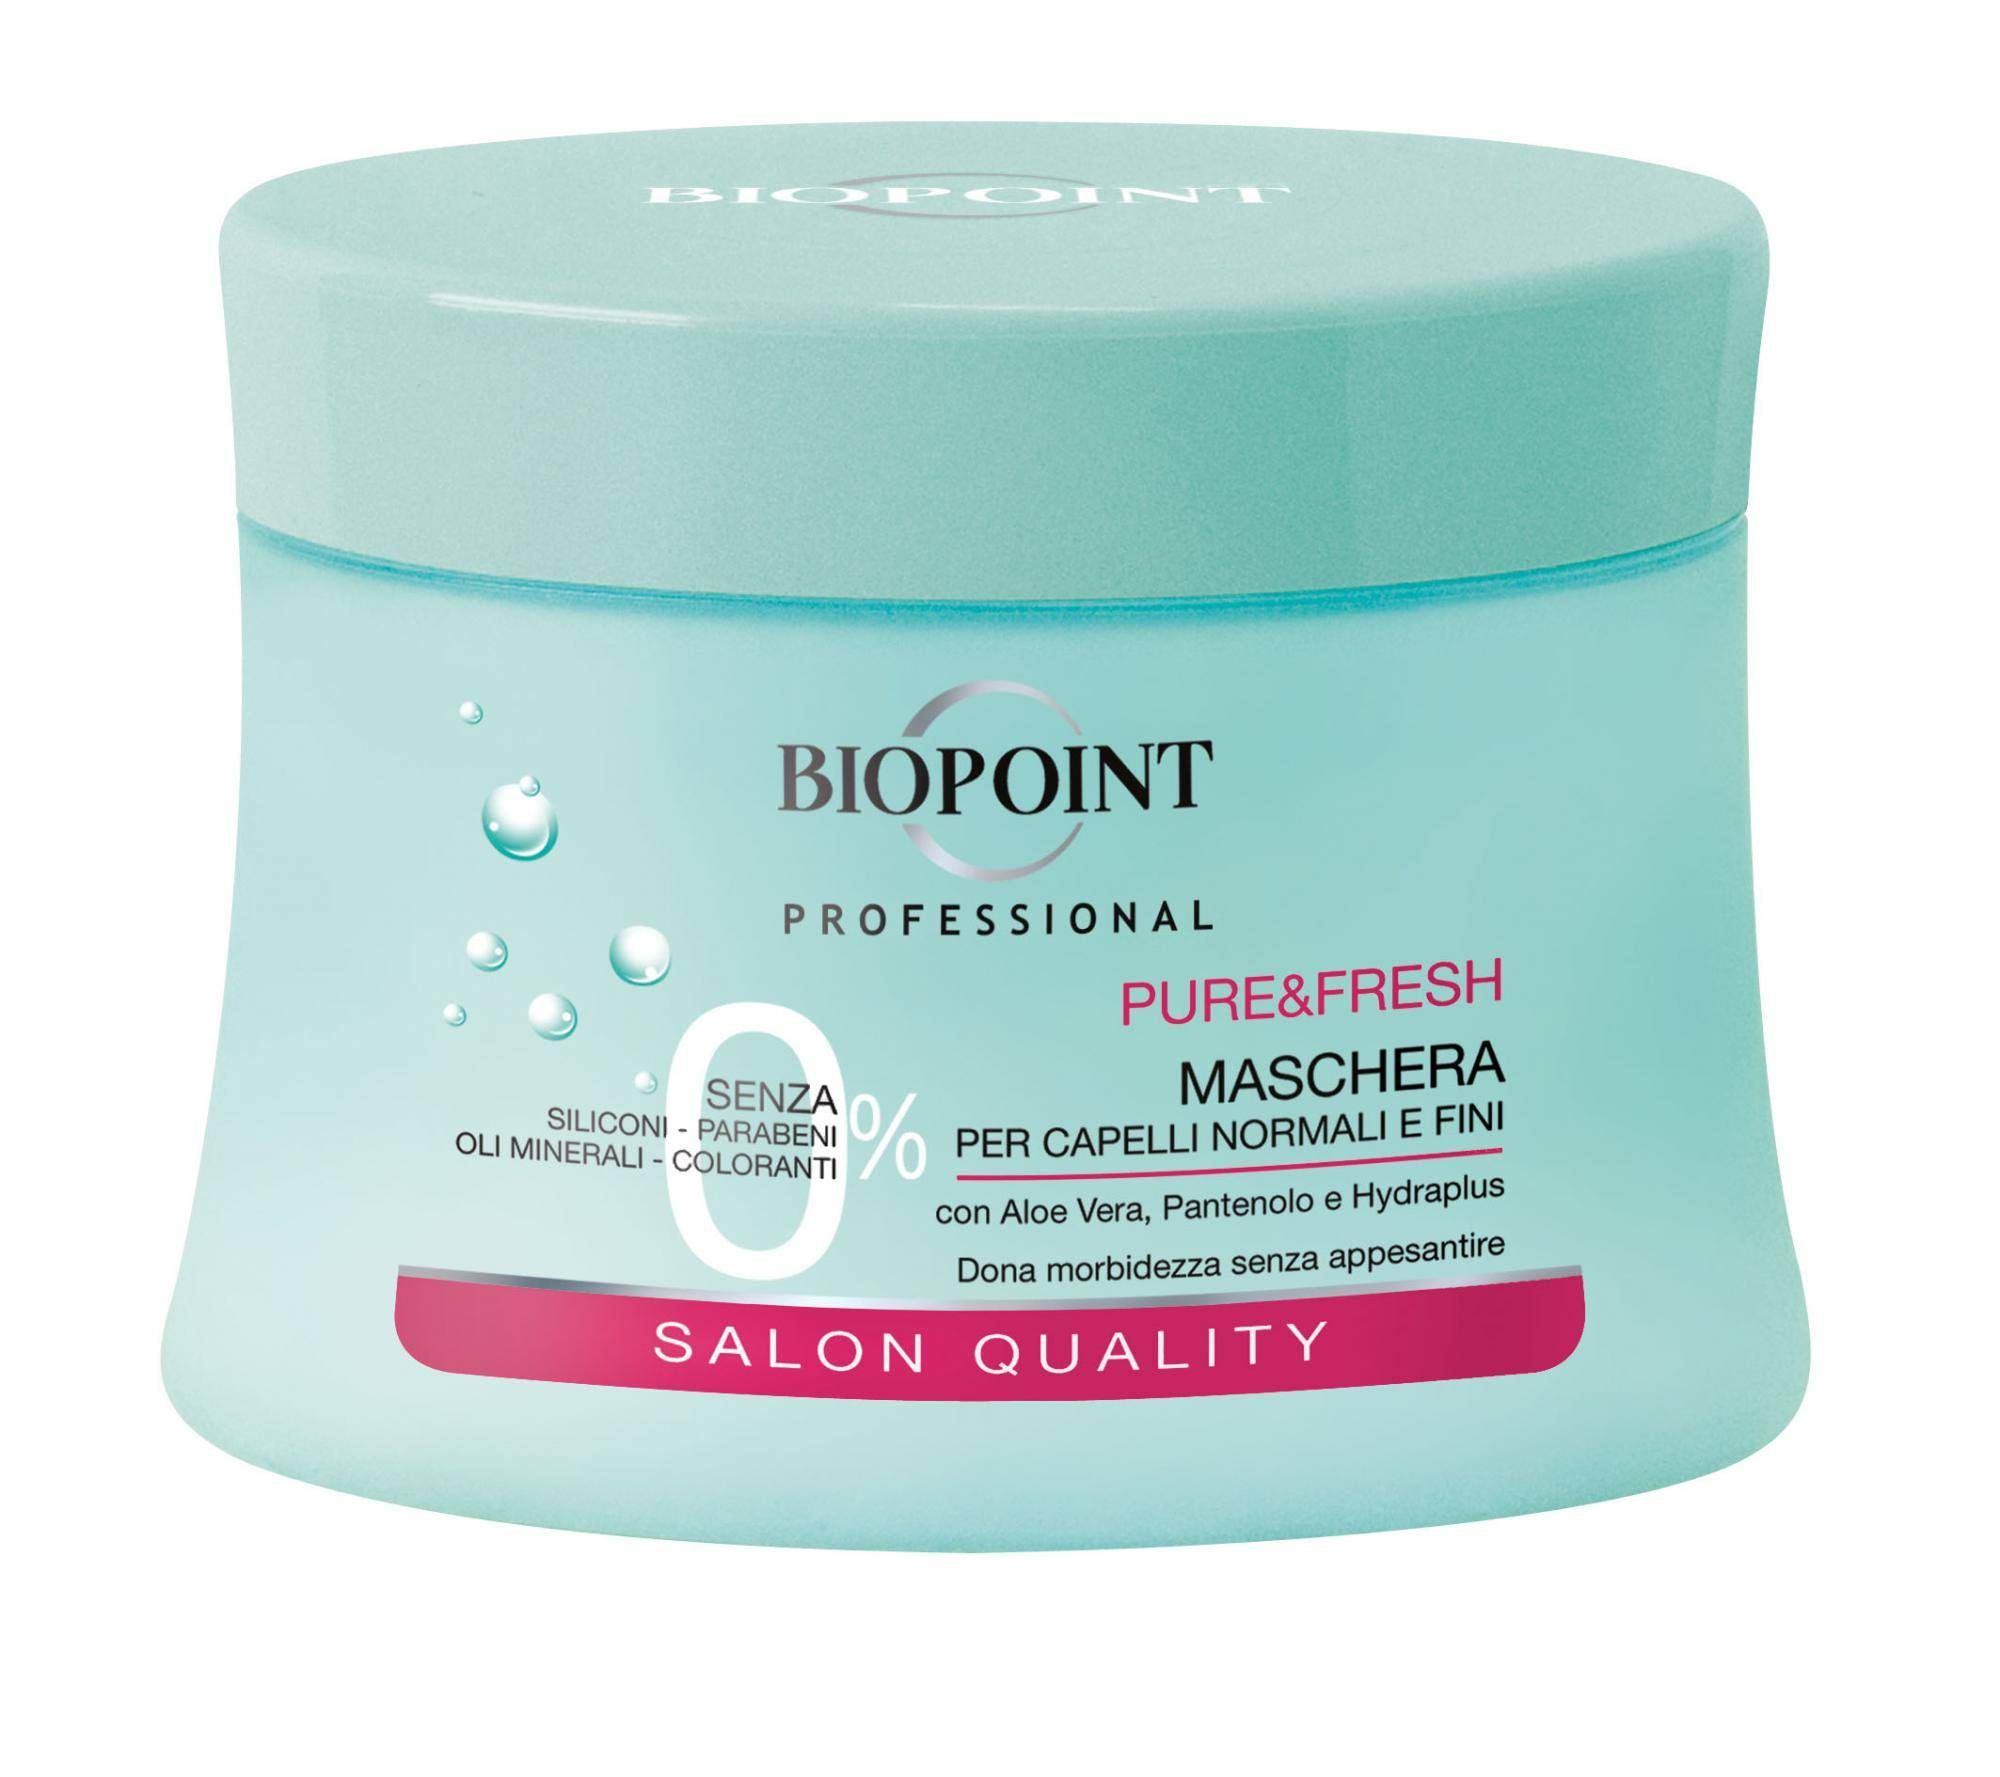 biopoint pv03817/pv04520 maschera per capelli 250 ml